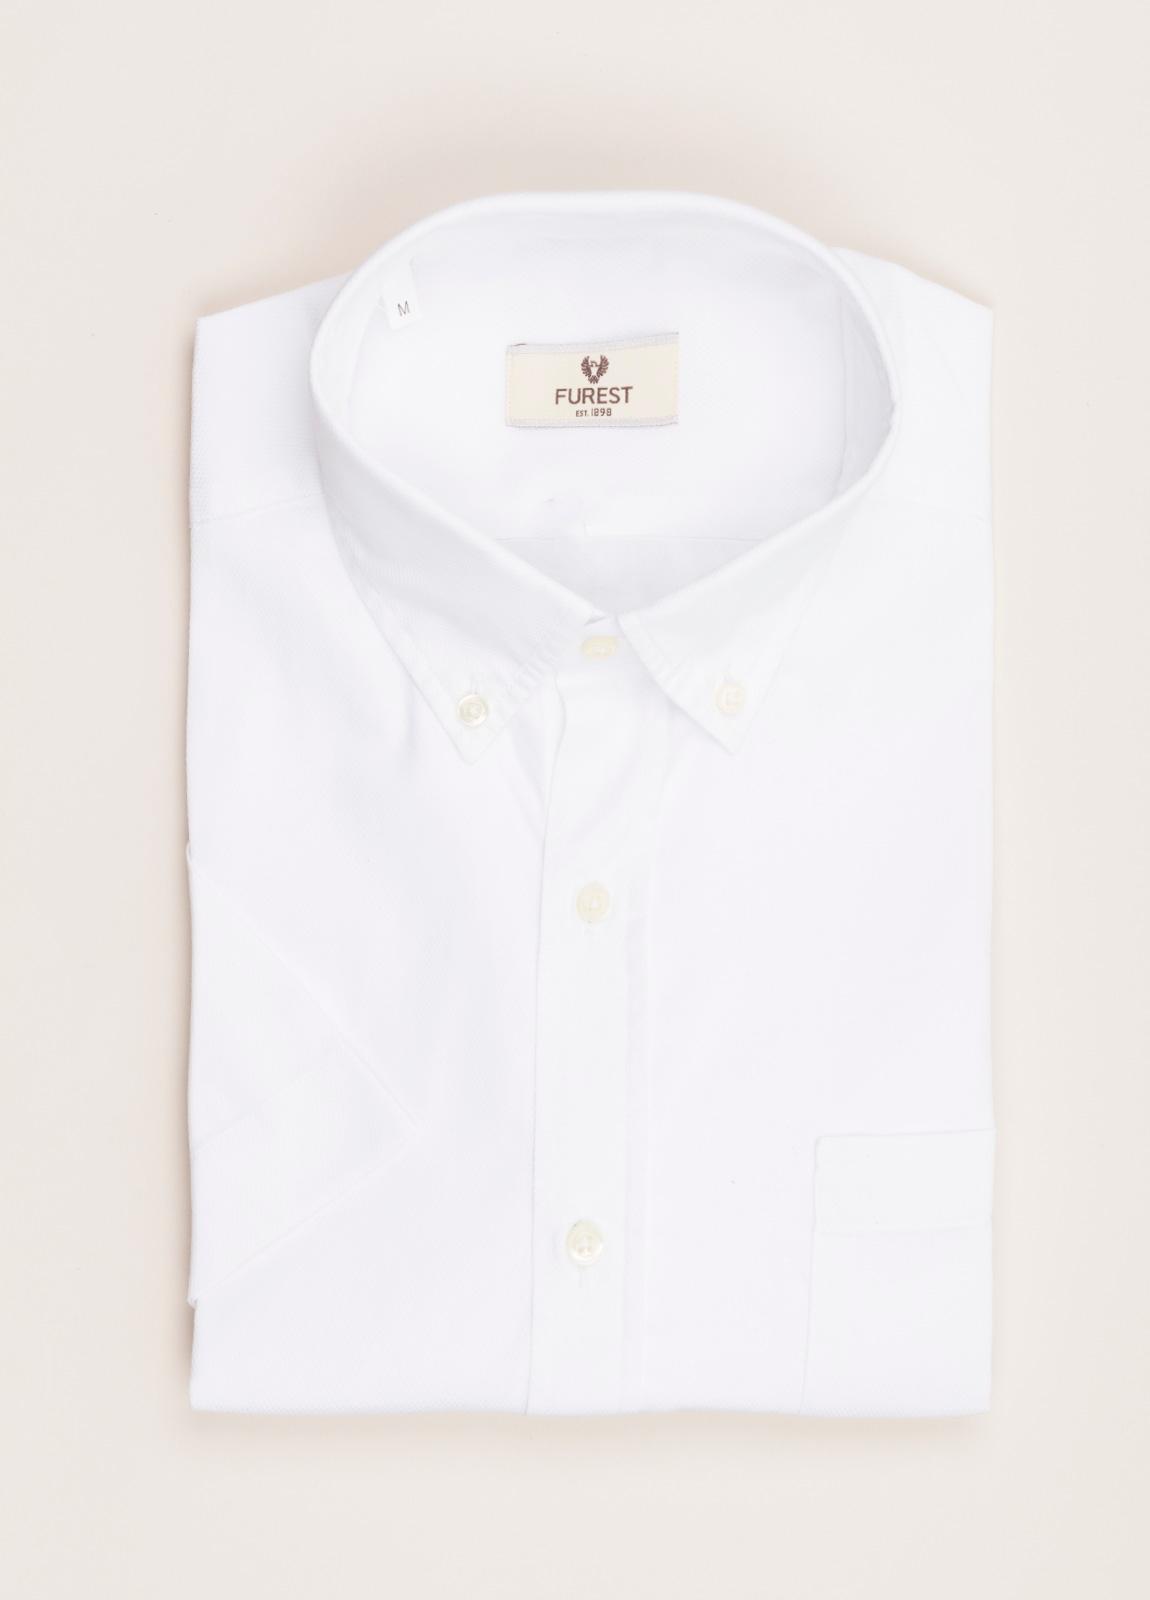 Camisa M/Corta sport FUREST COLECCIÓN Regular FIT blanco